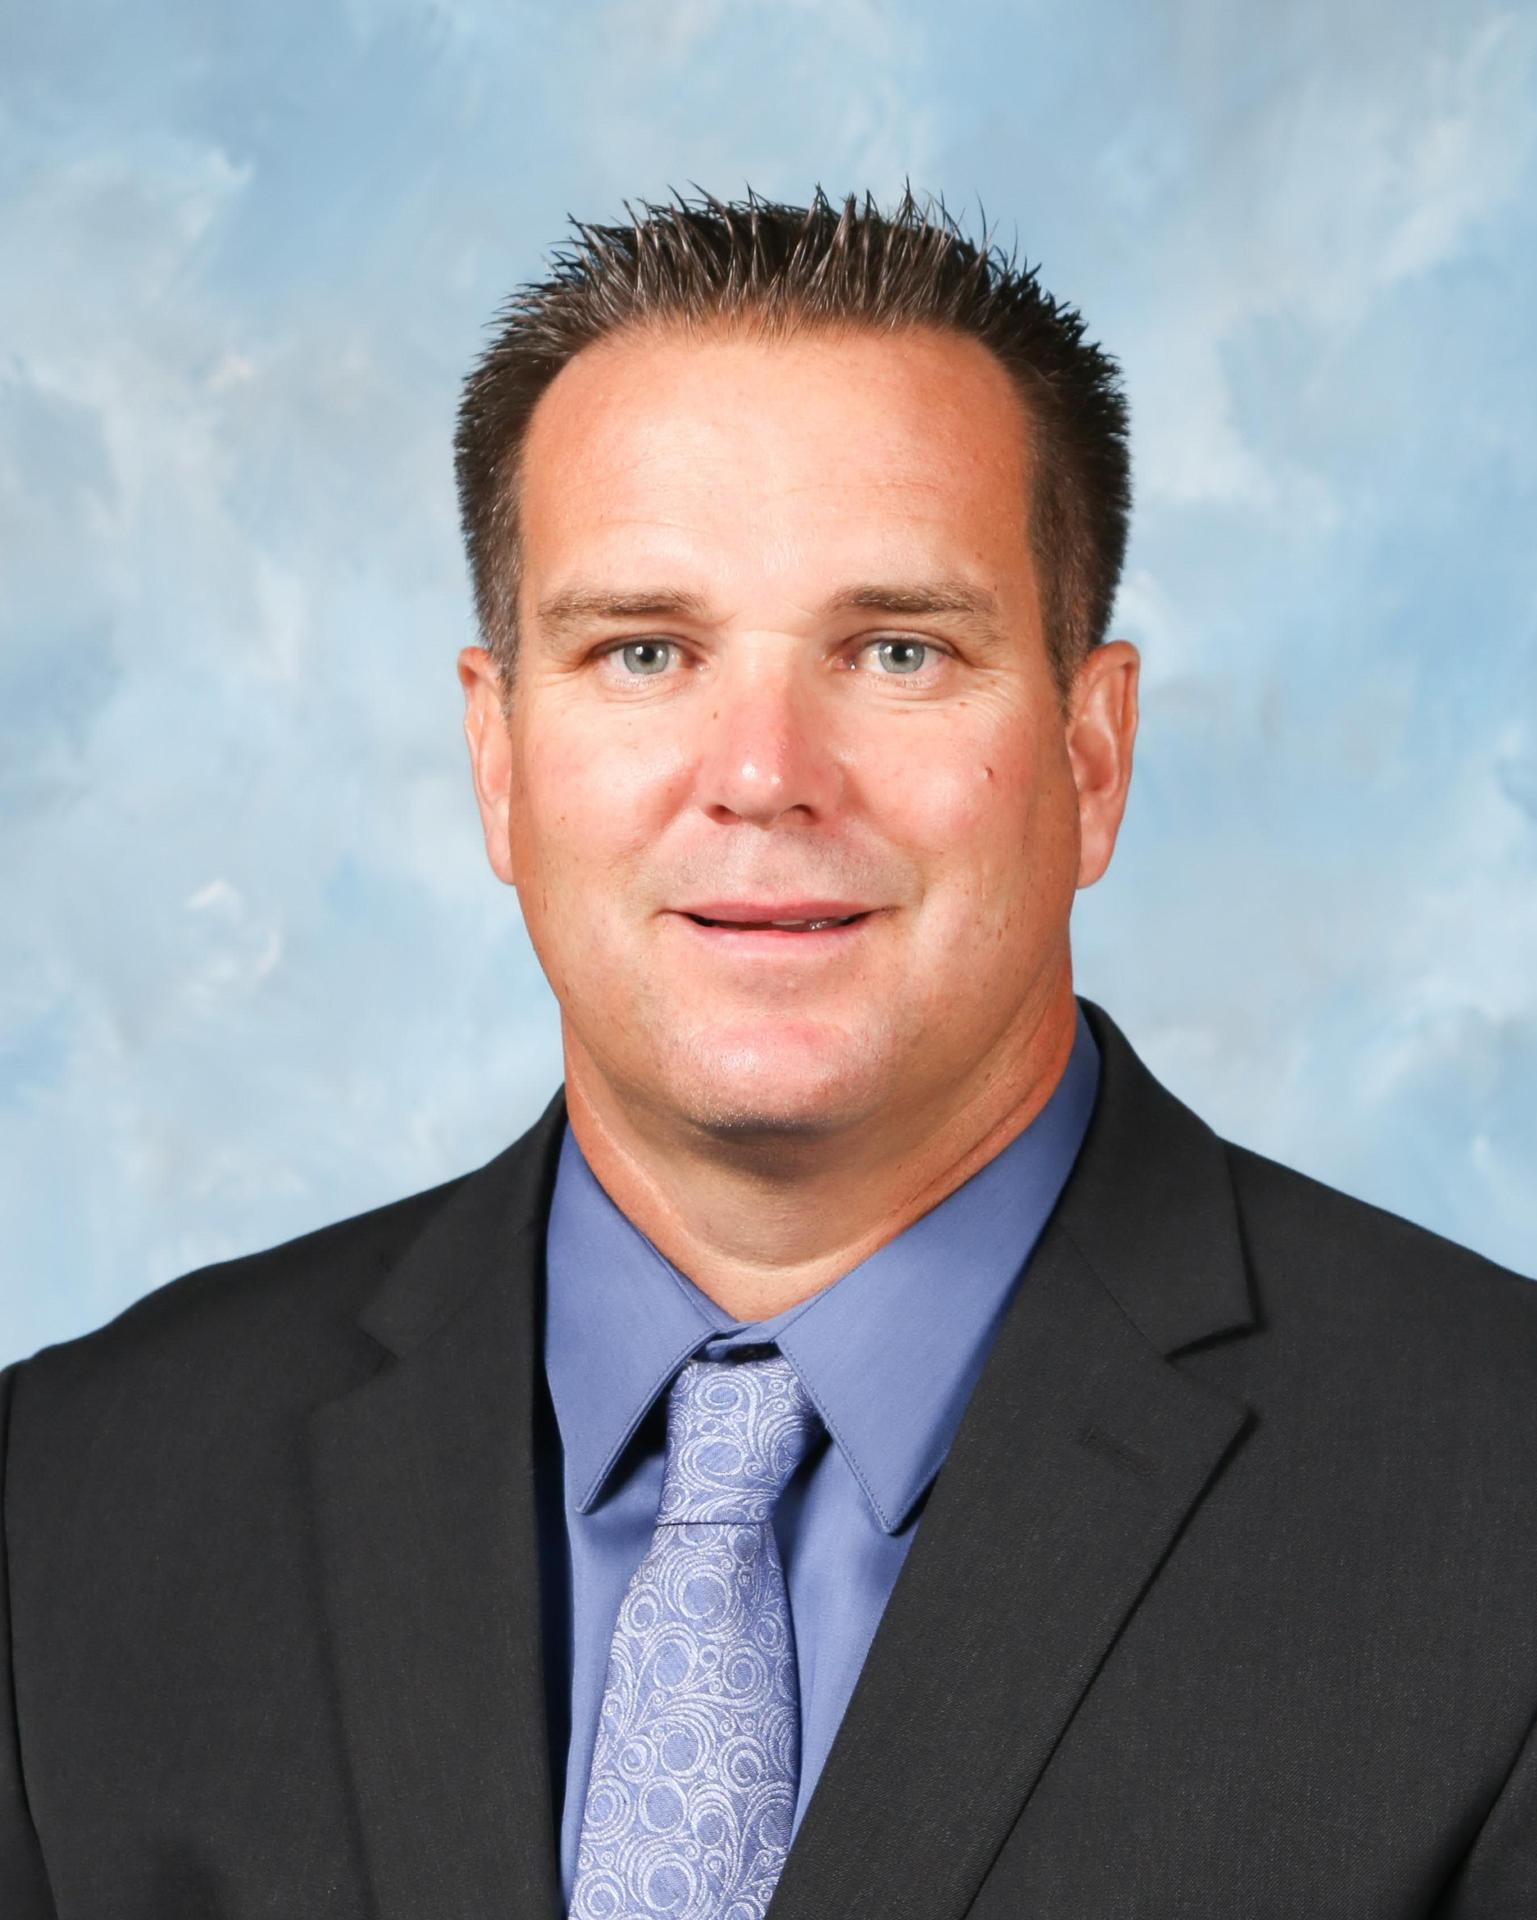 Photo of the principal, Jason Miller